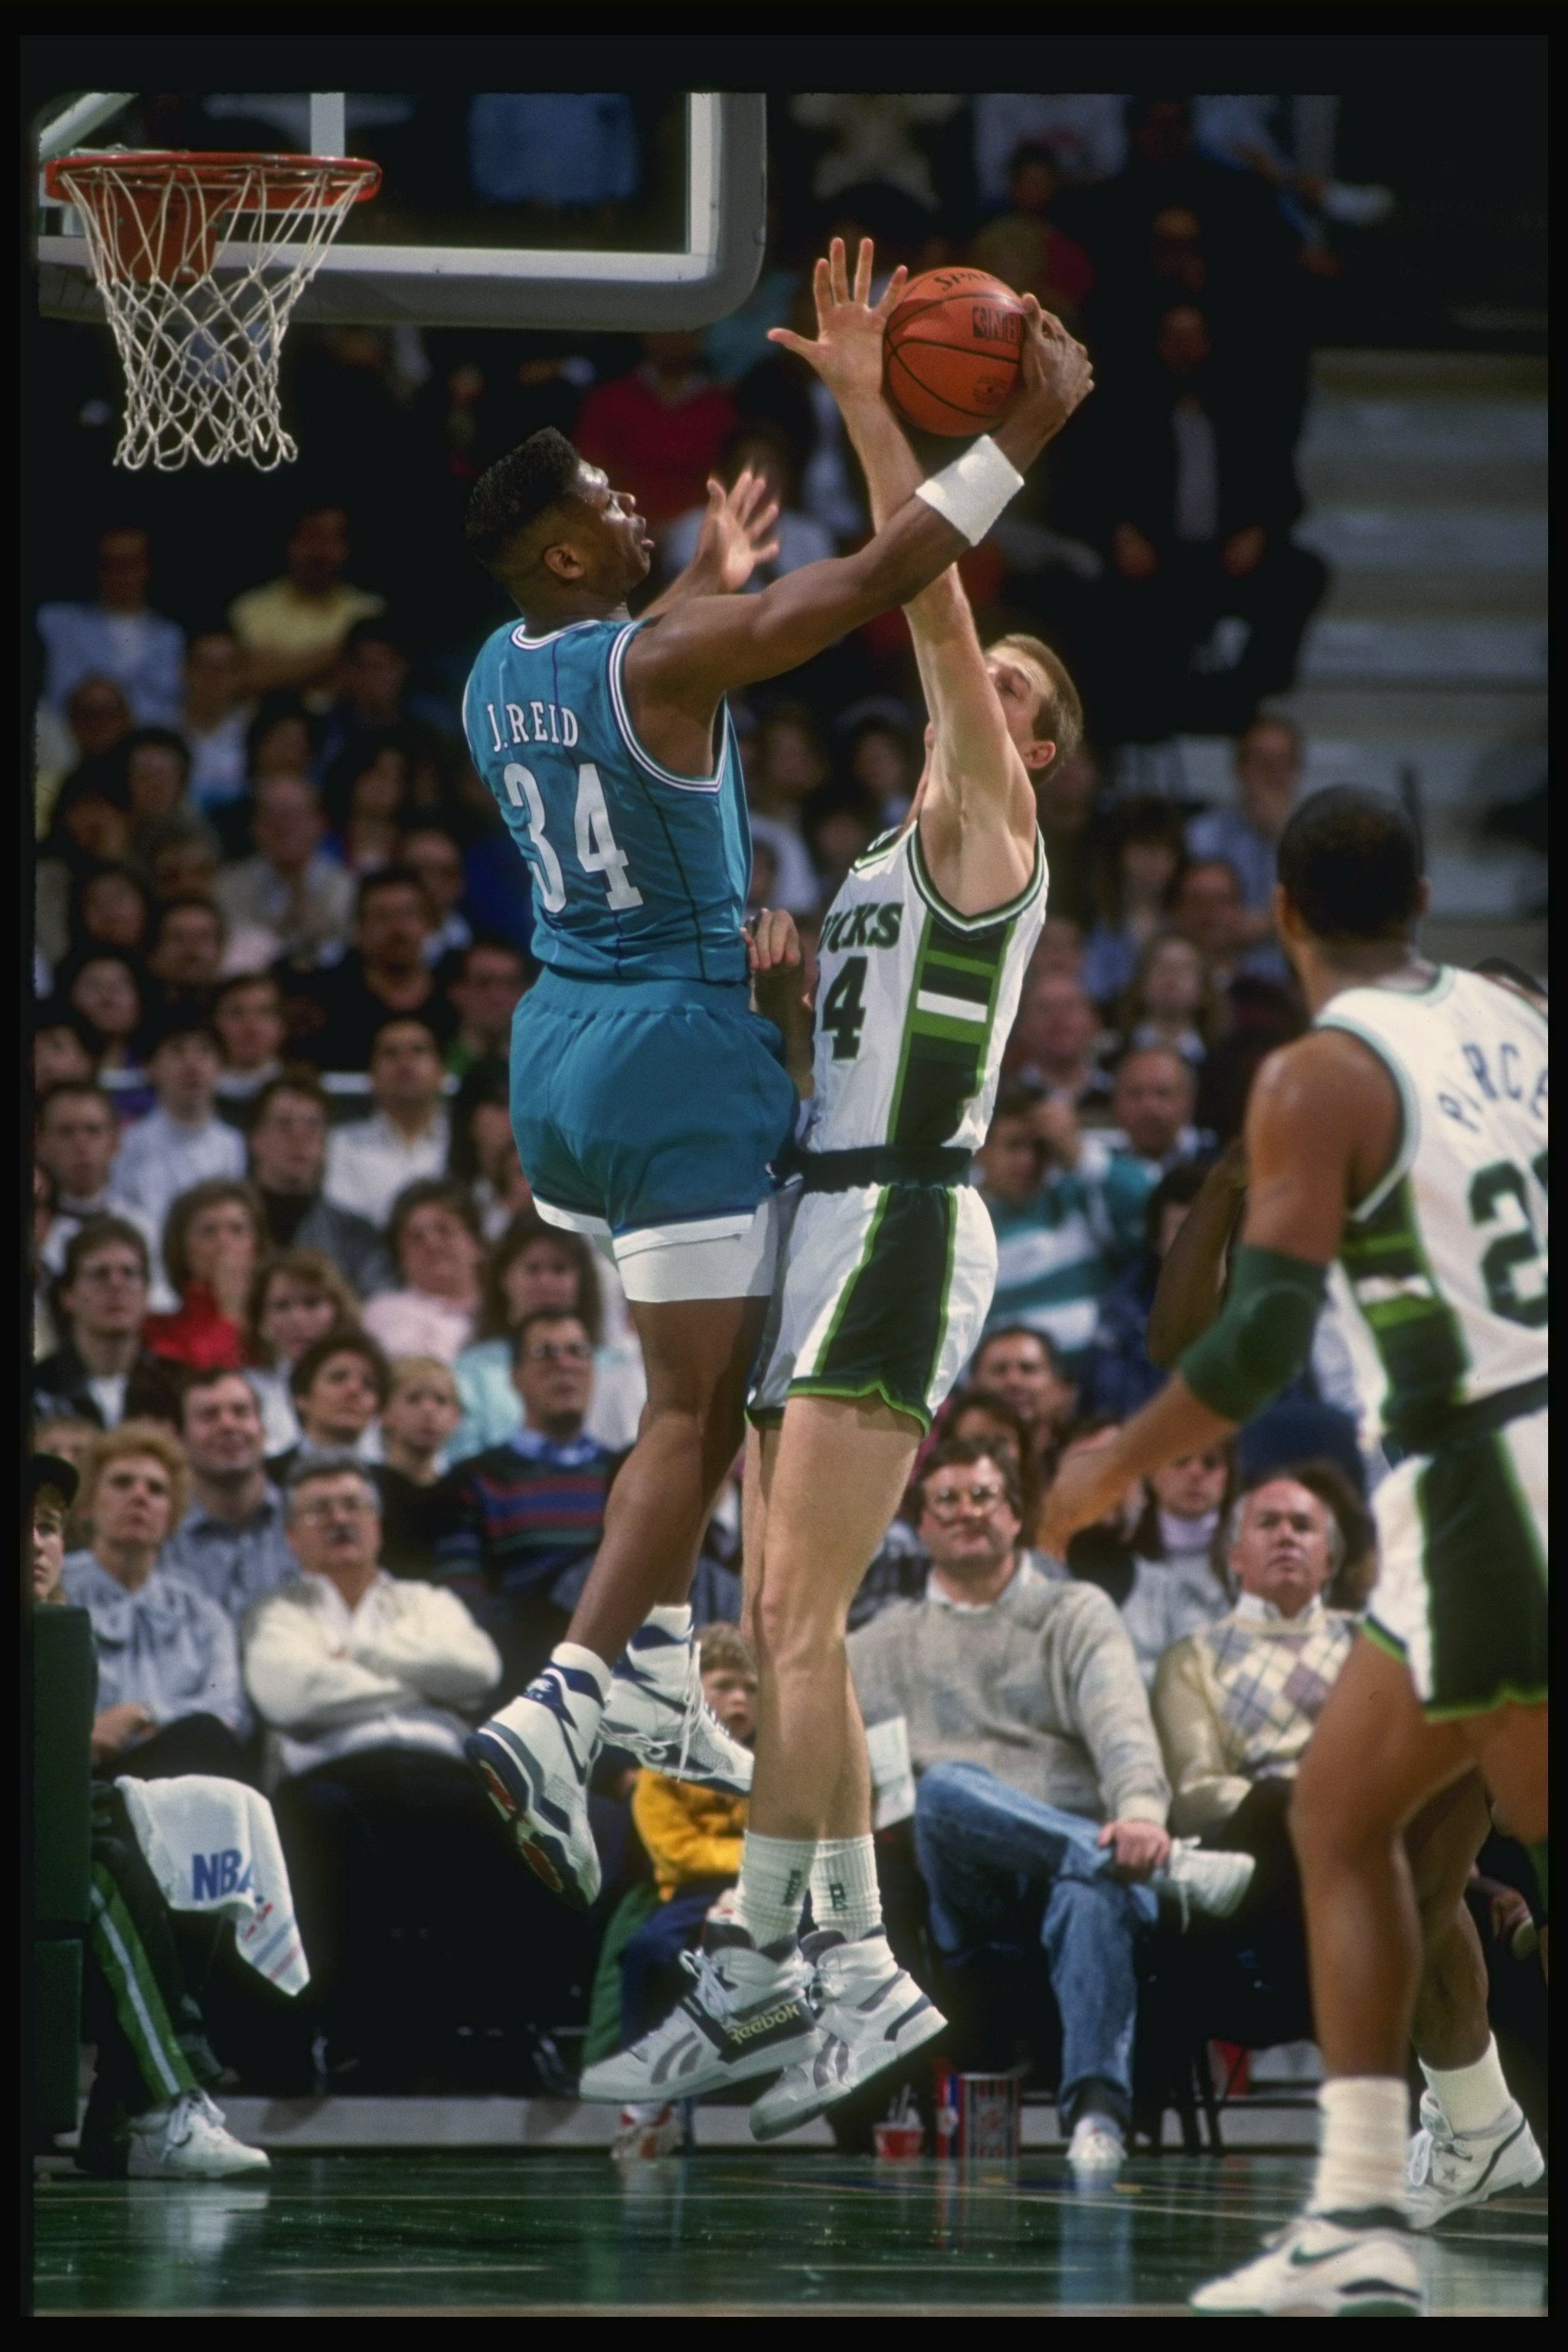 1989-1990:  Forward J. R. Reid of the Charlotte Hornets (left) battles for the ball with center Brad Lohaus of the Milwaukee Bucks during a game at the Bradley Center in Milwaukee, Wisconsin. Mandatory Credit: Allsport  /Allsport